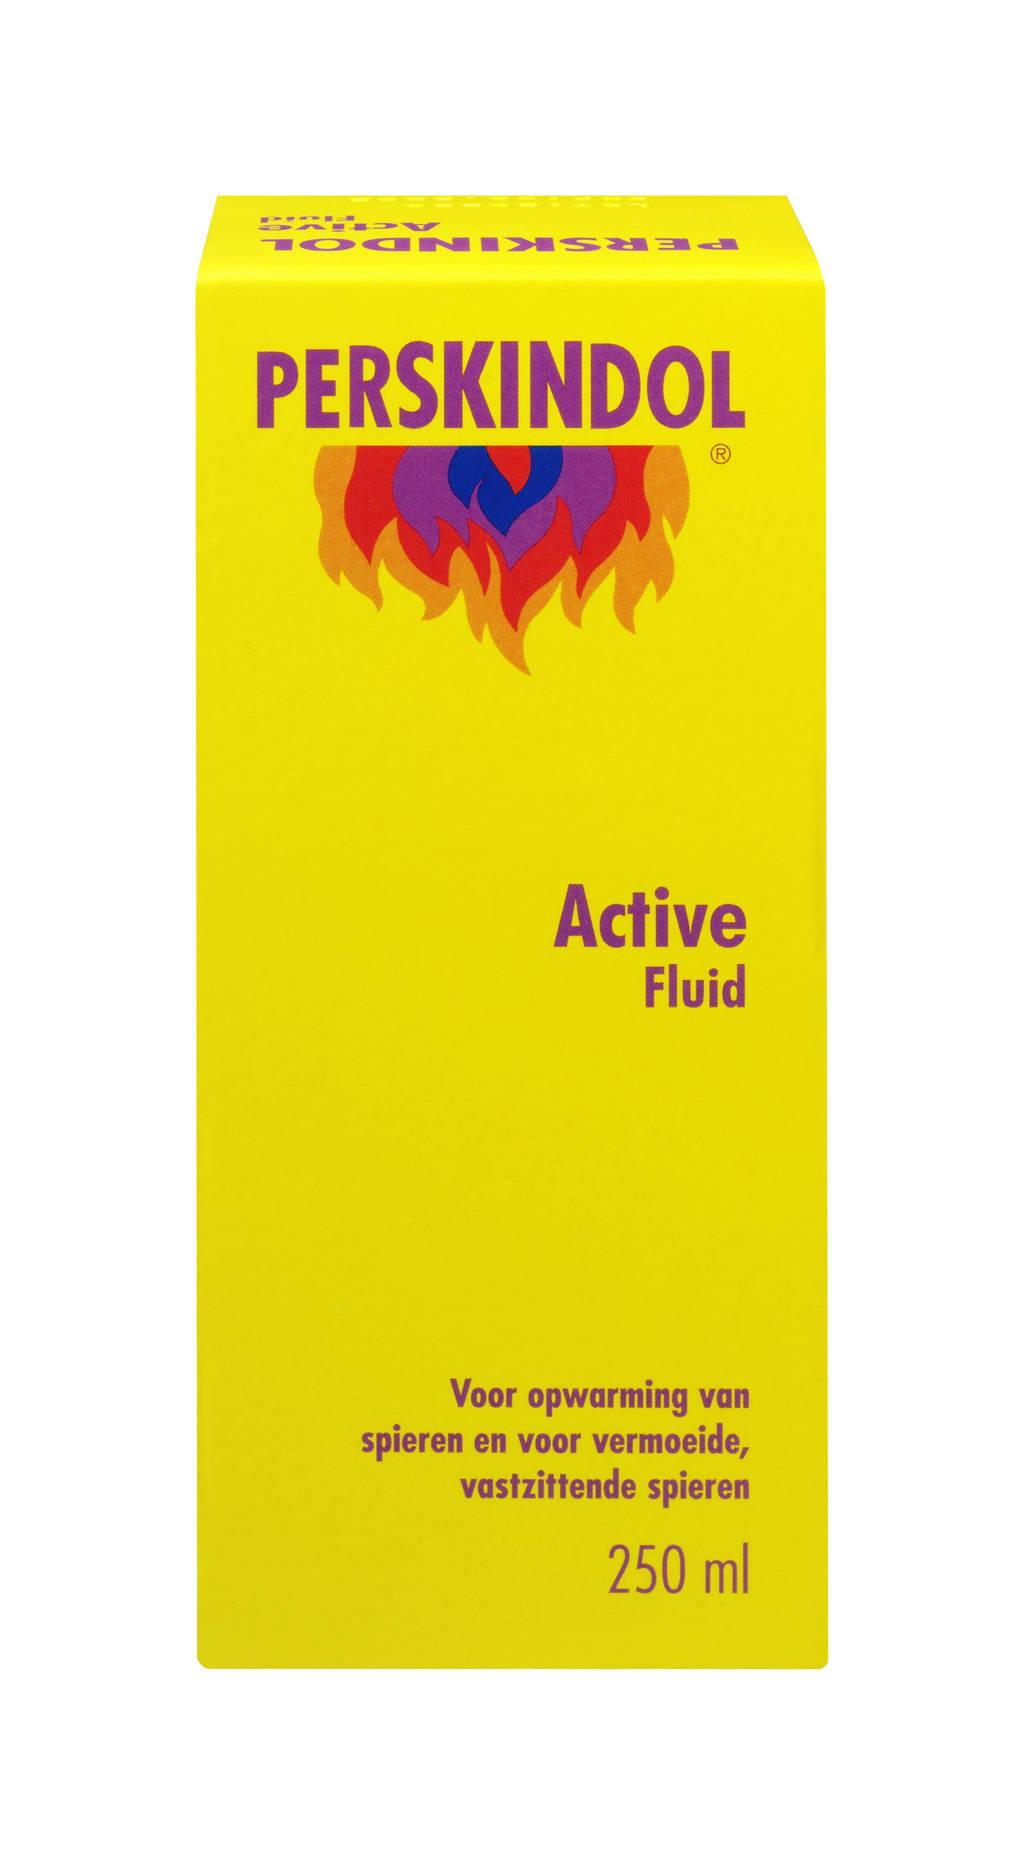 Perskindol Active Fluid - 250 ml